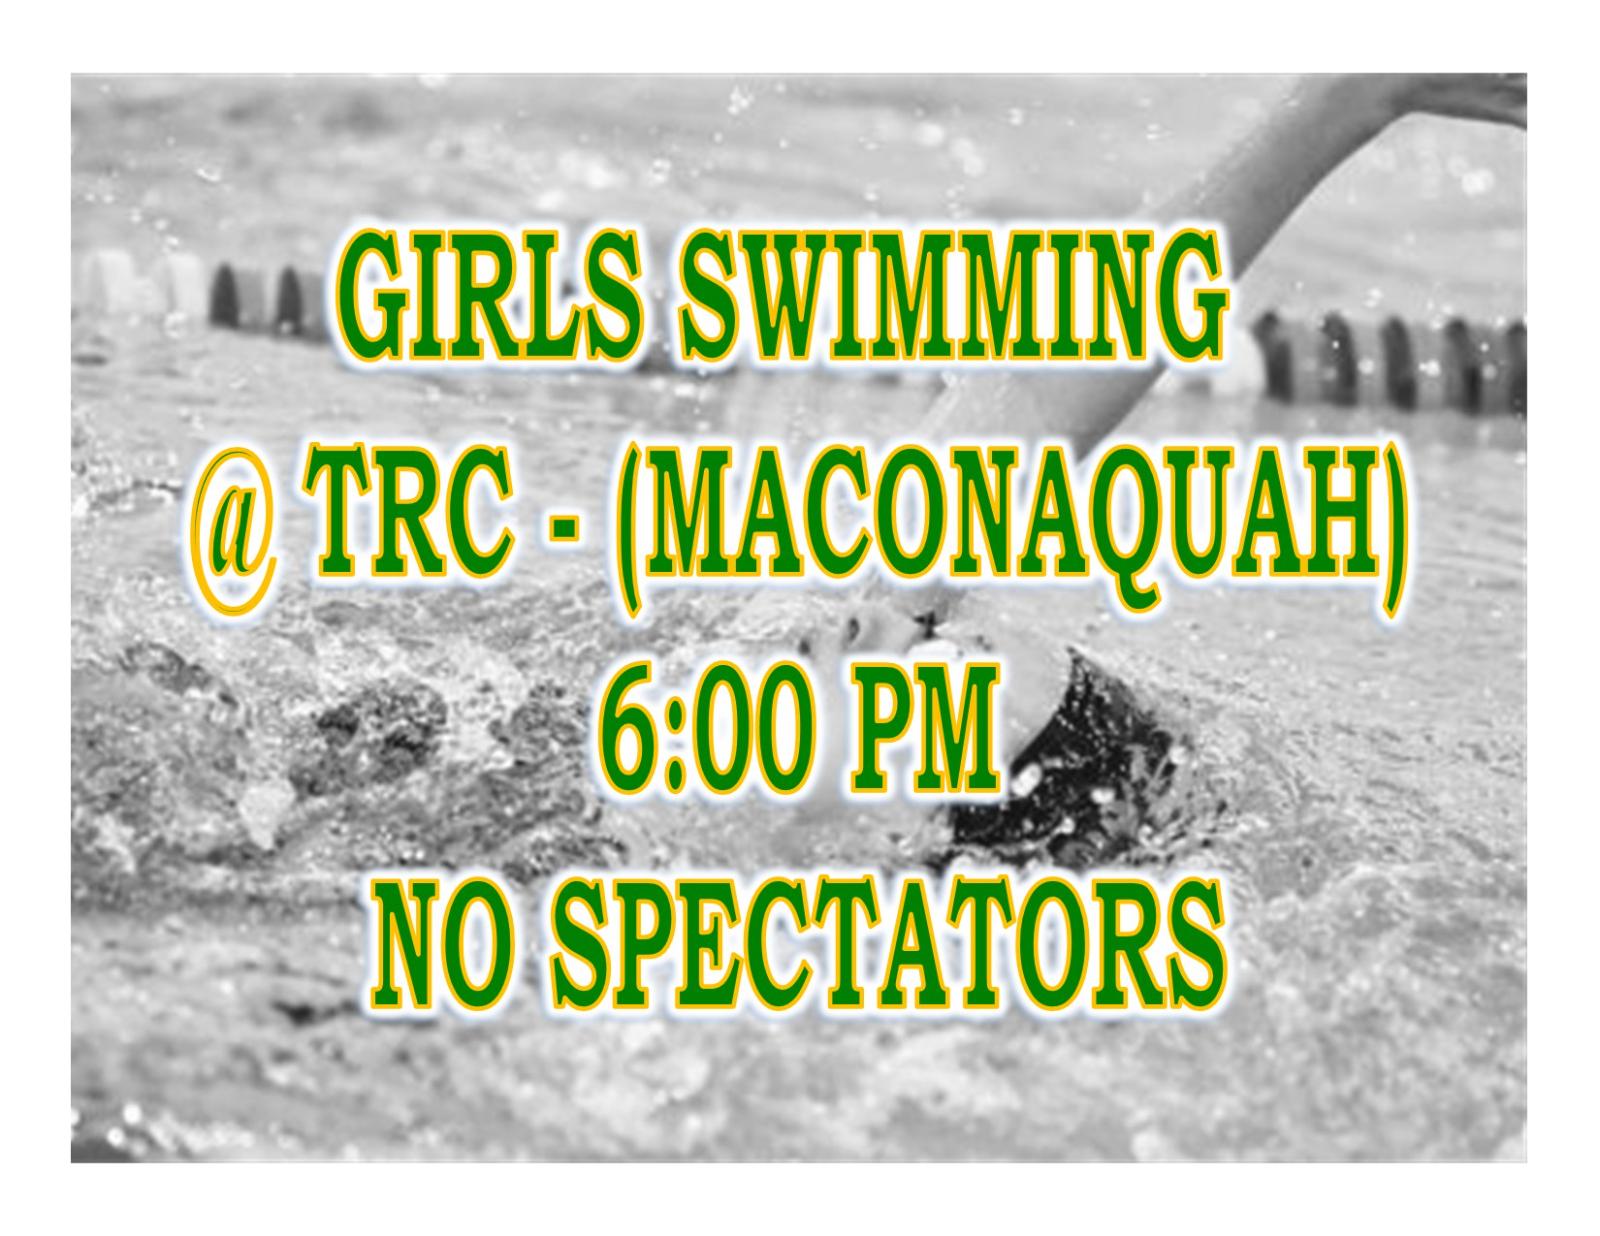 TONIGHT: Girls Swimming @ TRC + Streaming Link – No Spectators